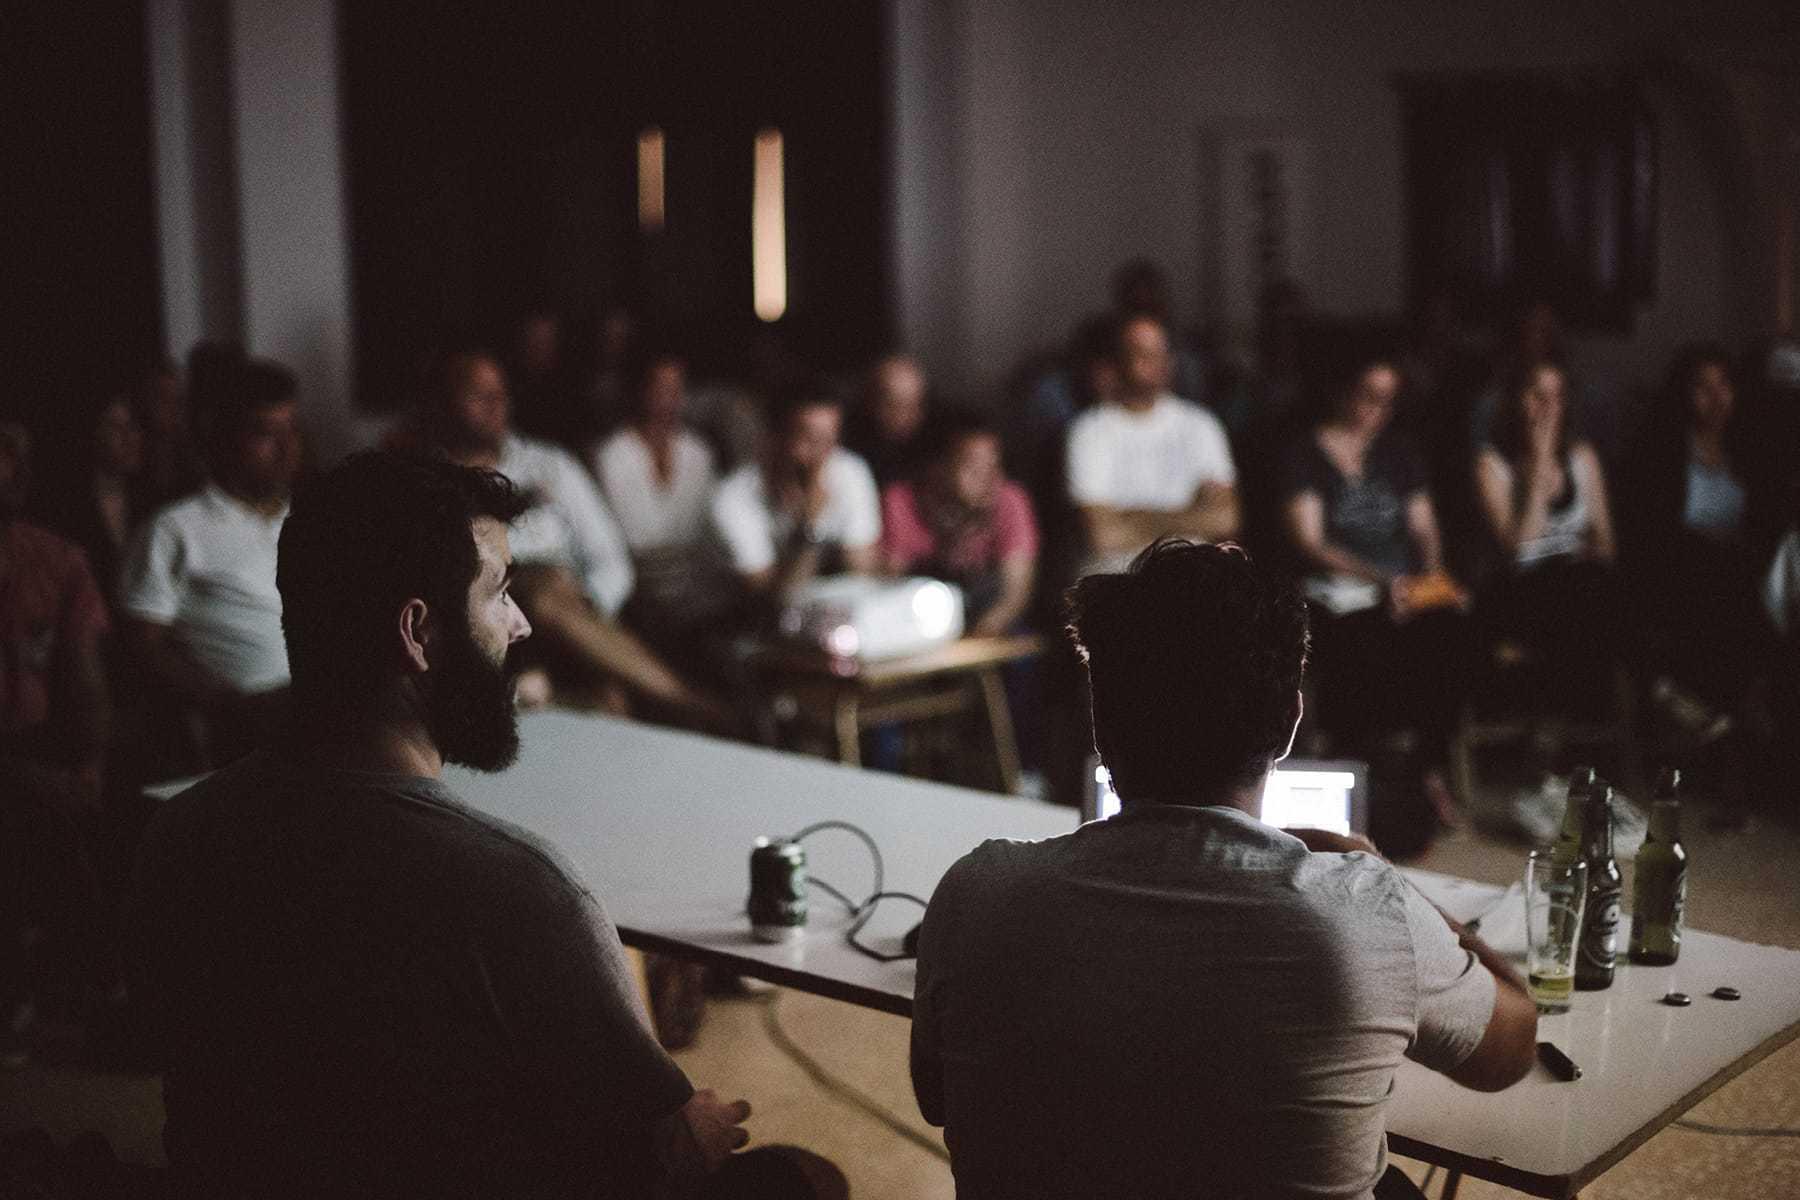 wolves_workshop_hilario_sanchez_fotografo_boda_españa_402